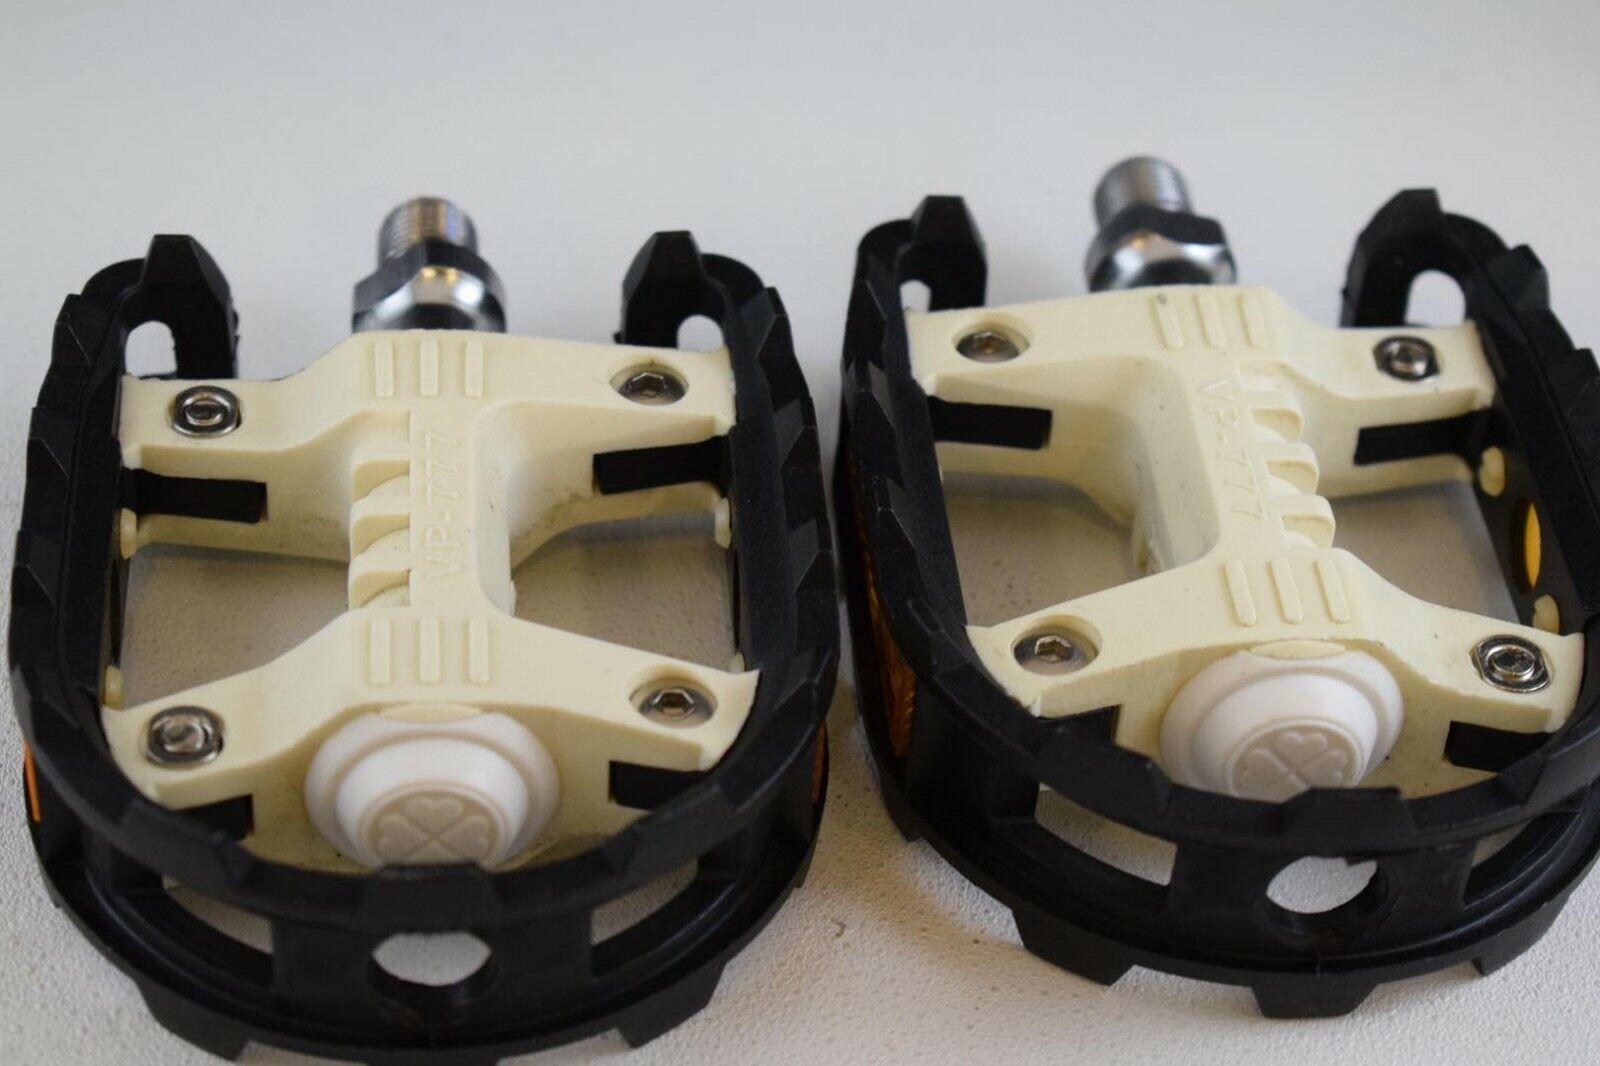 VP 777 1 2'' pedal set old school bmx chrome axle negro blancooo plastic body NOS